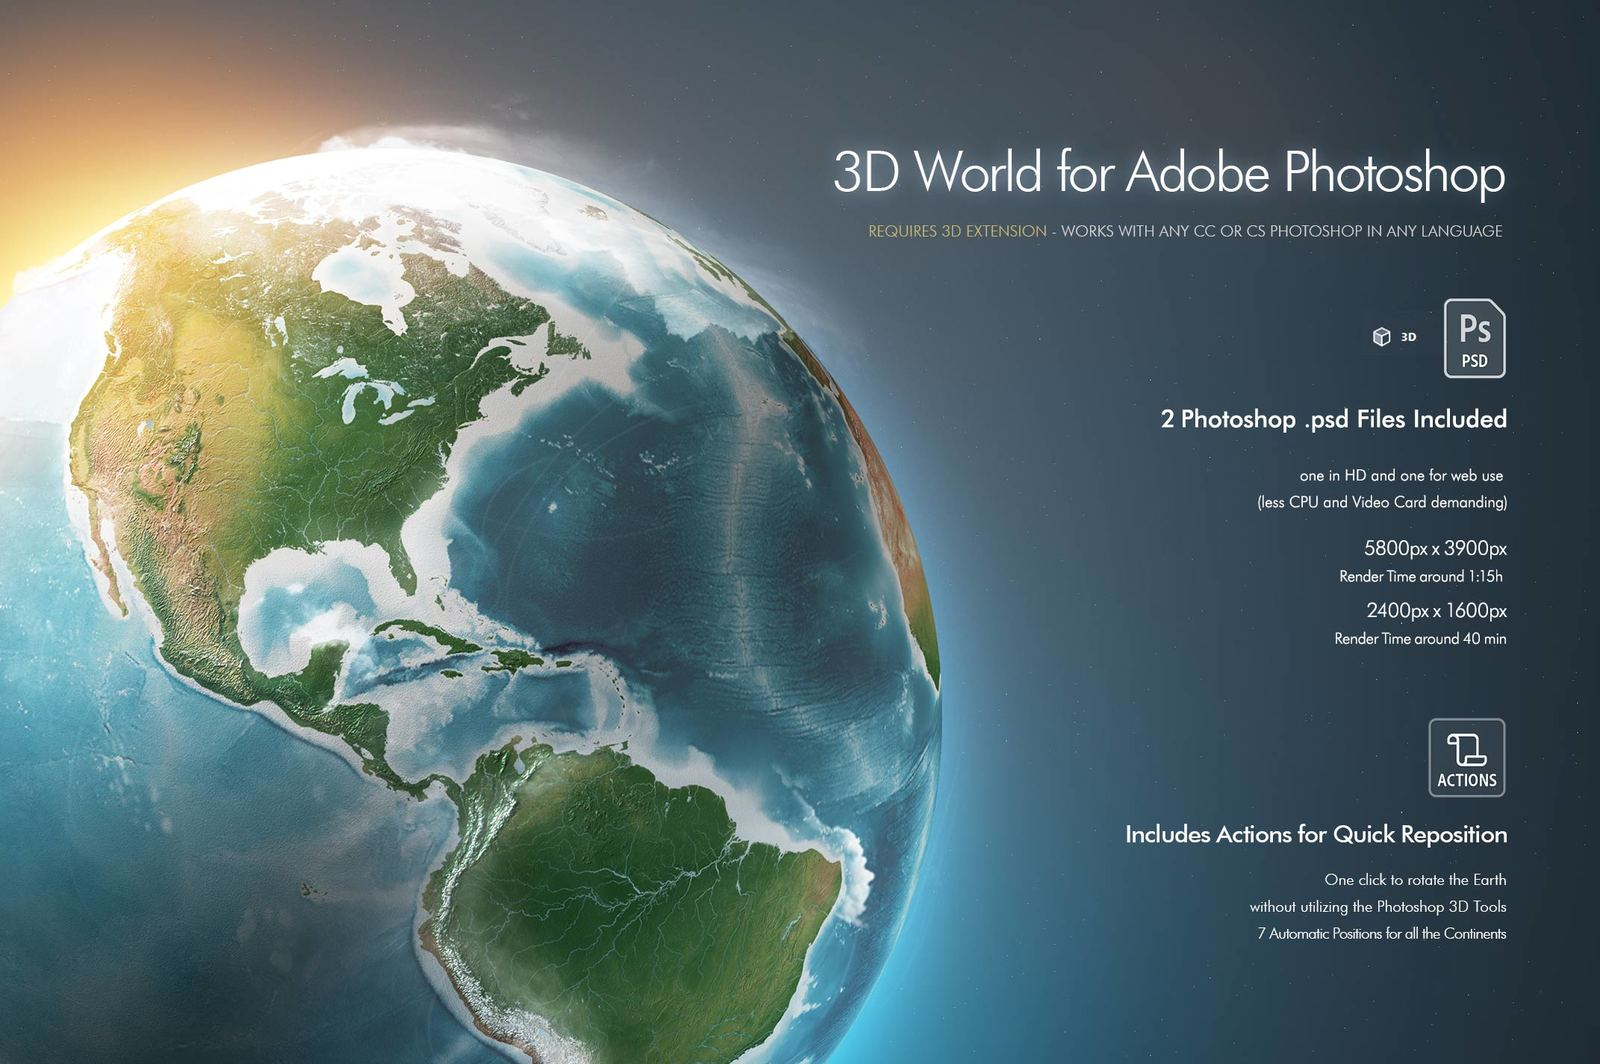 Photoshop 3D World